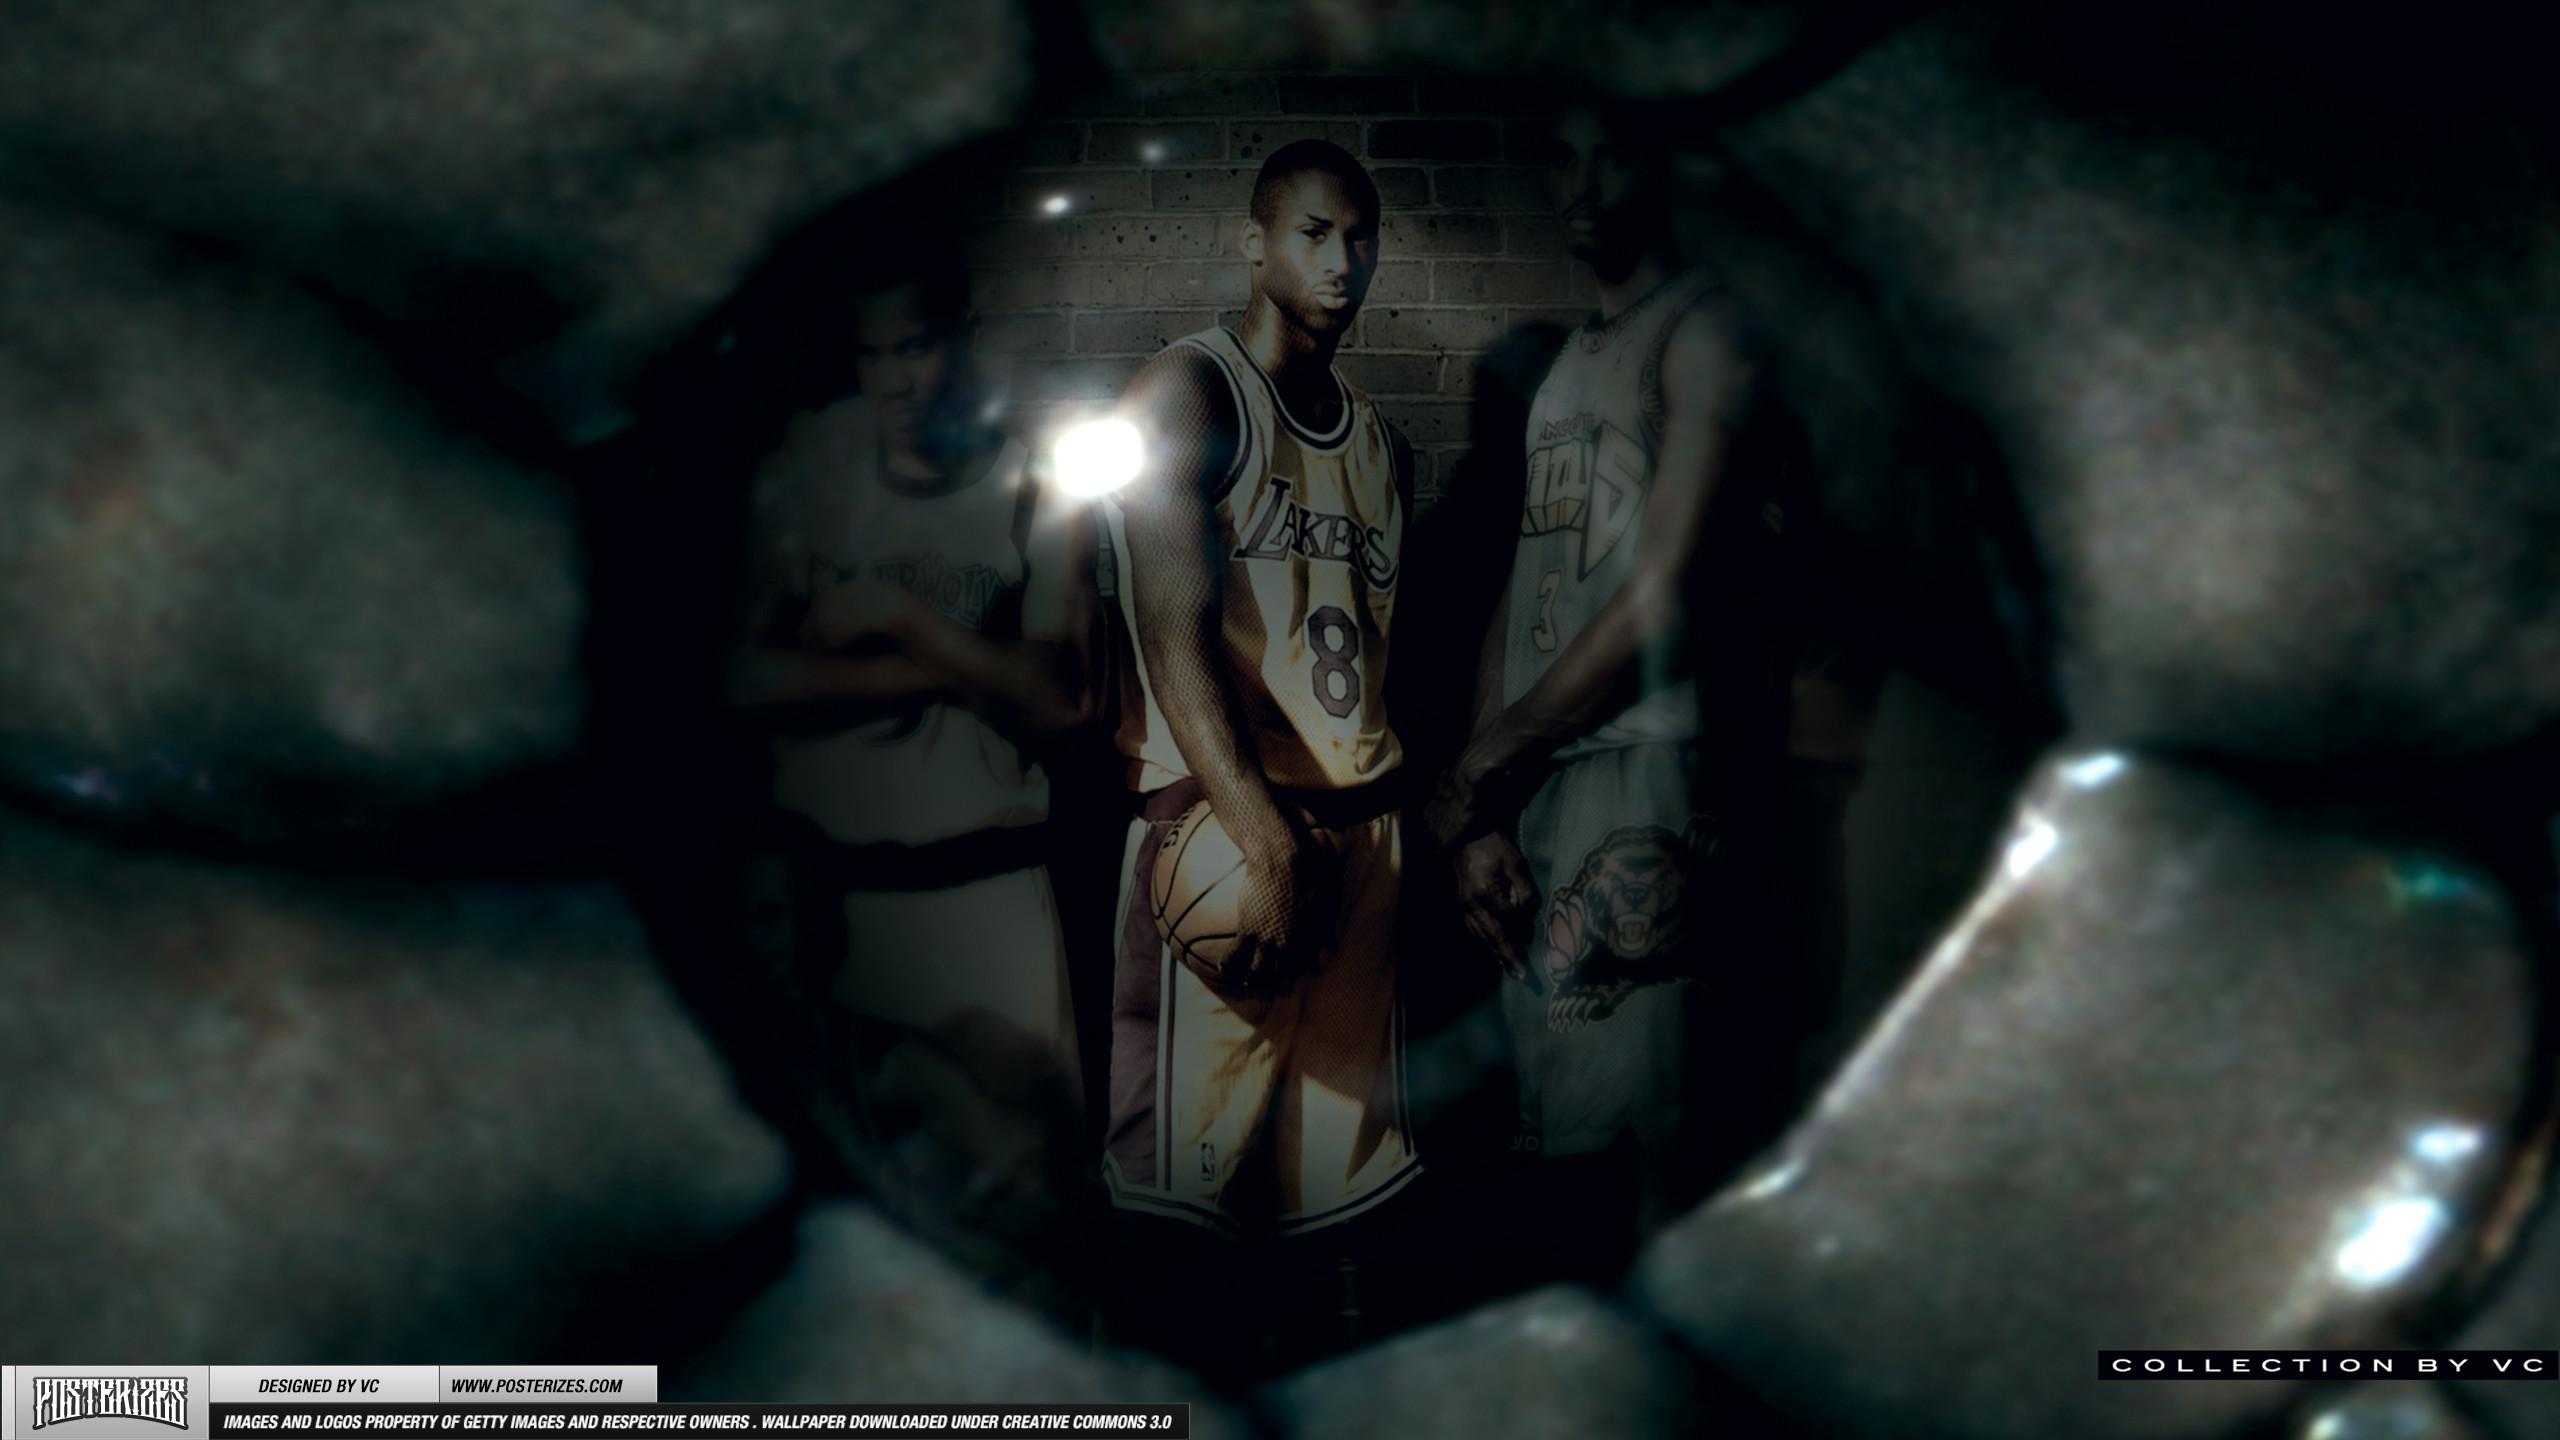 Kobe Bryant 'Eye of the Mamba' Wallpaper